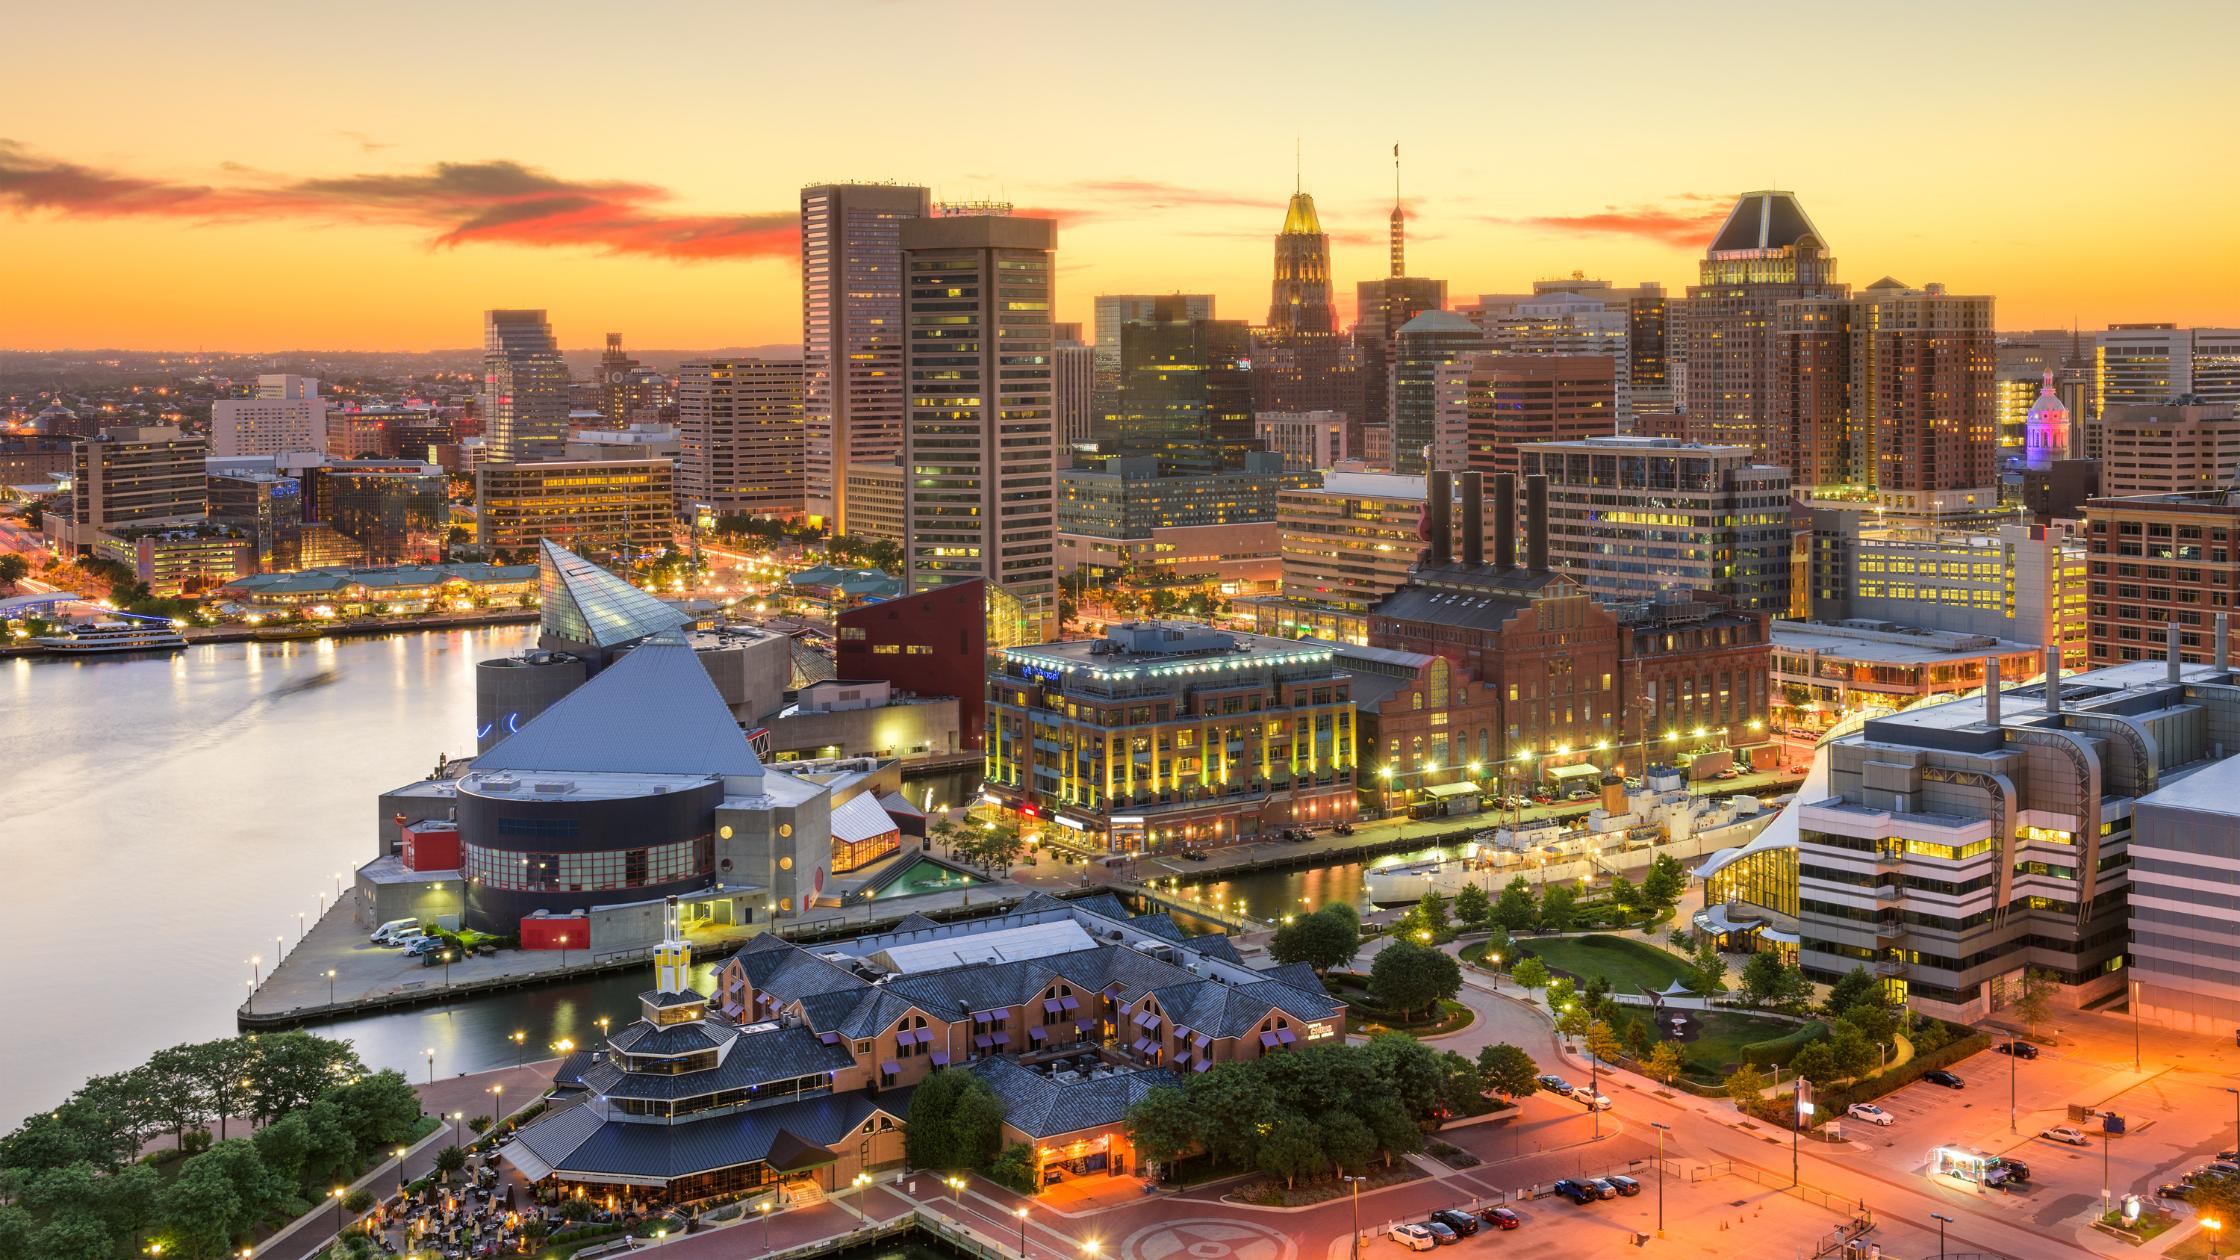 Snag-A-Slip blog - Baltimore, Maryland